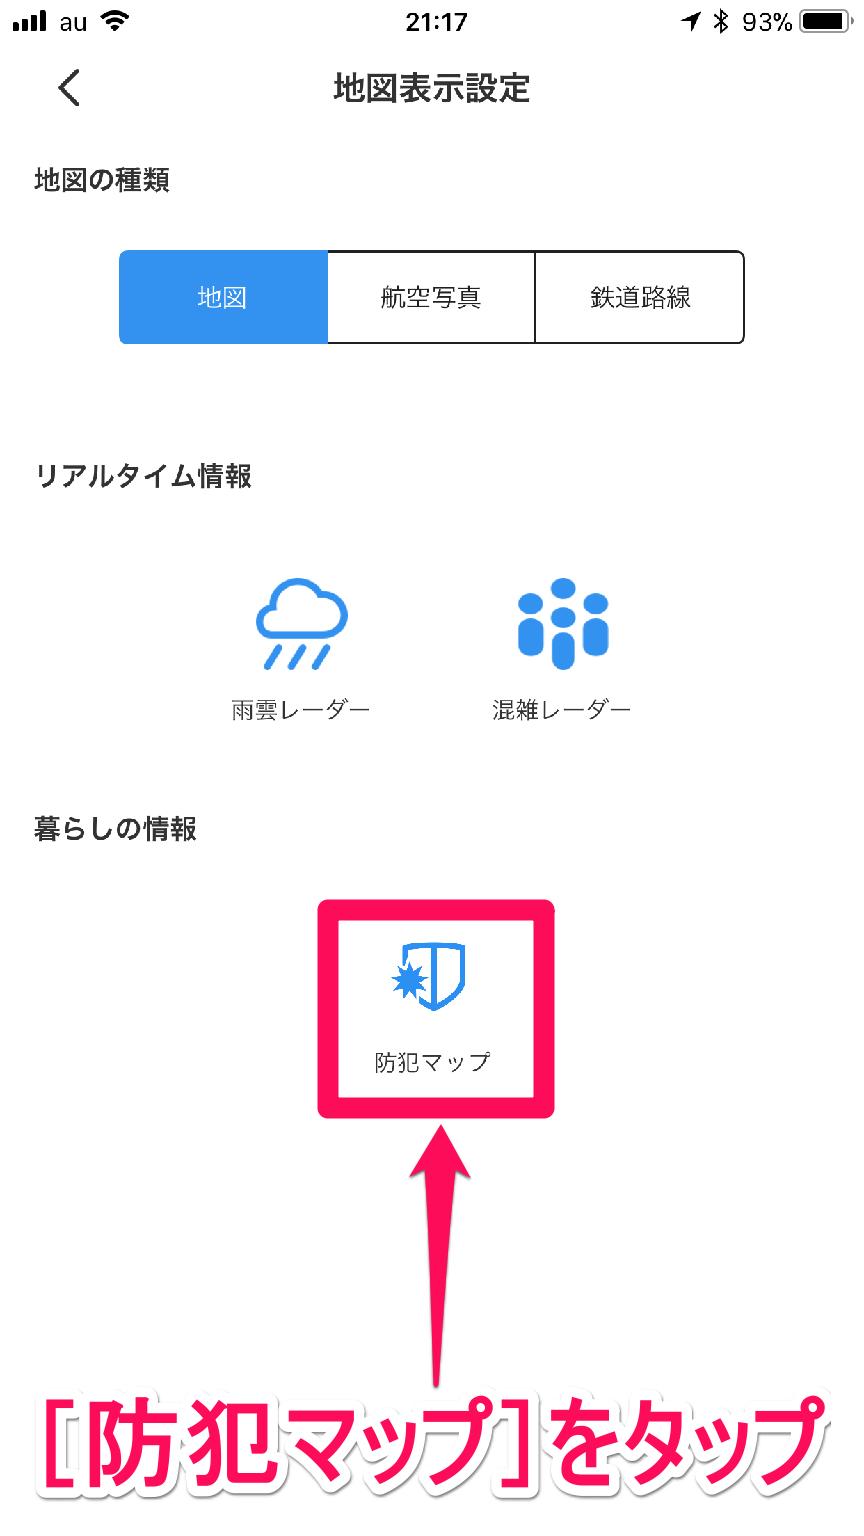 iPhone(アイフォーン)の[Yahoo! MAP]アプリ(ヤフーマップ)の[地図表示設定]画面